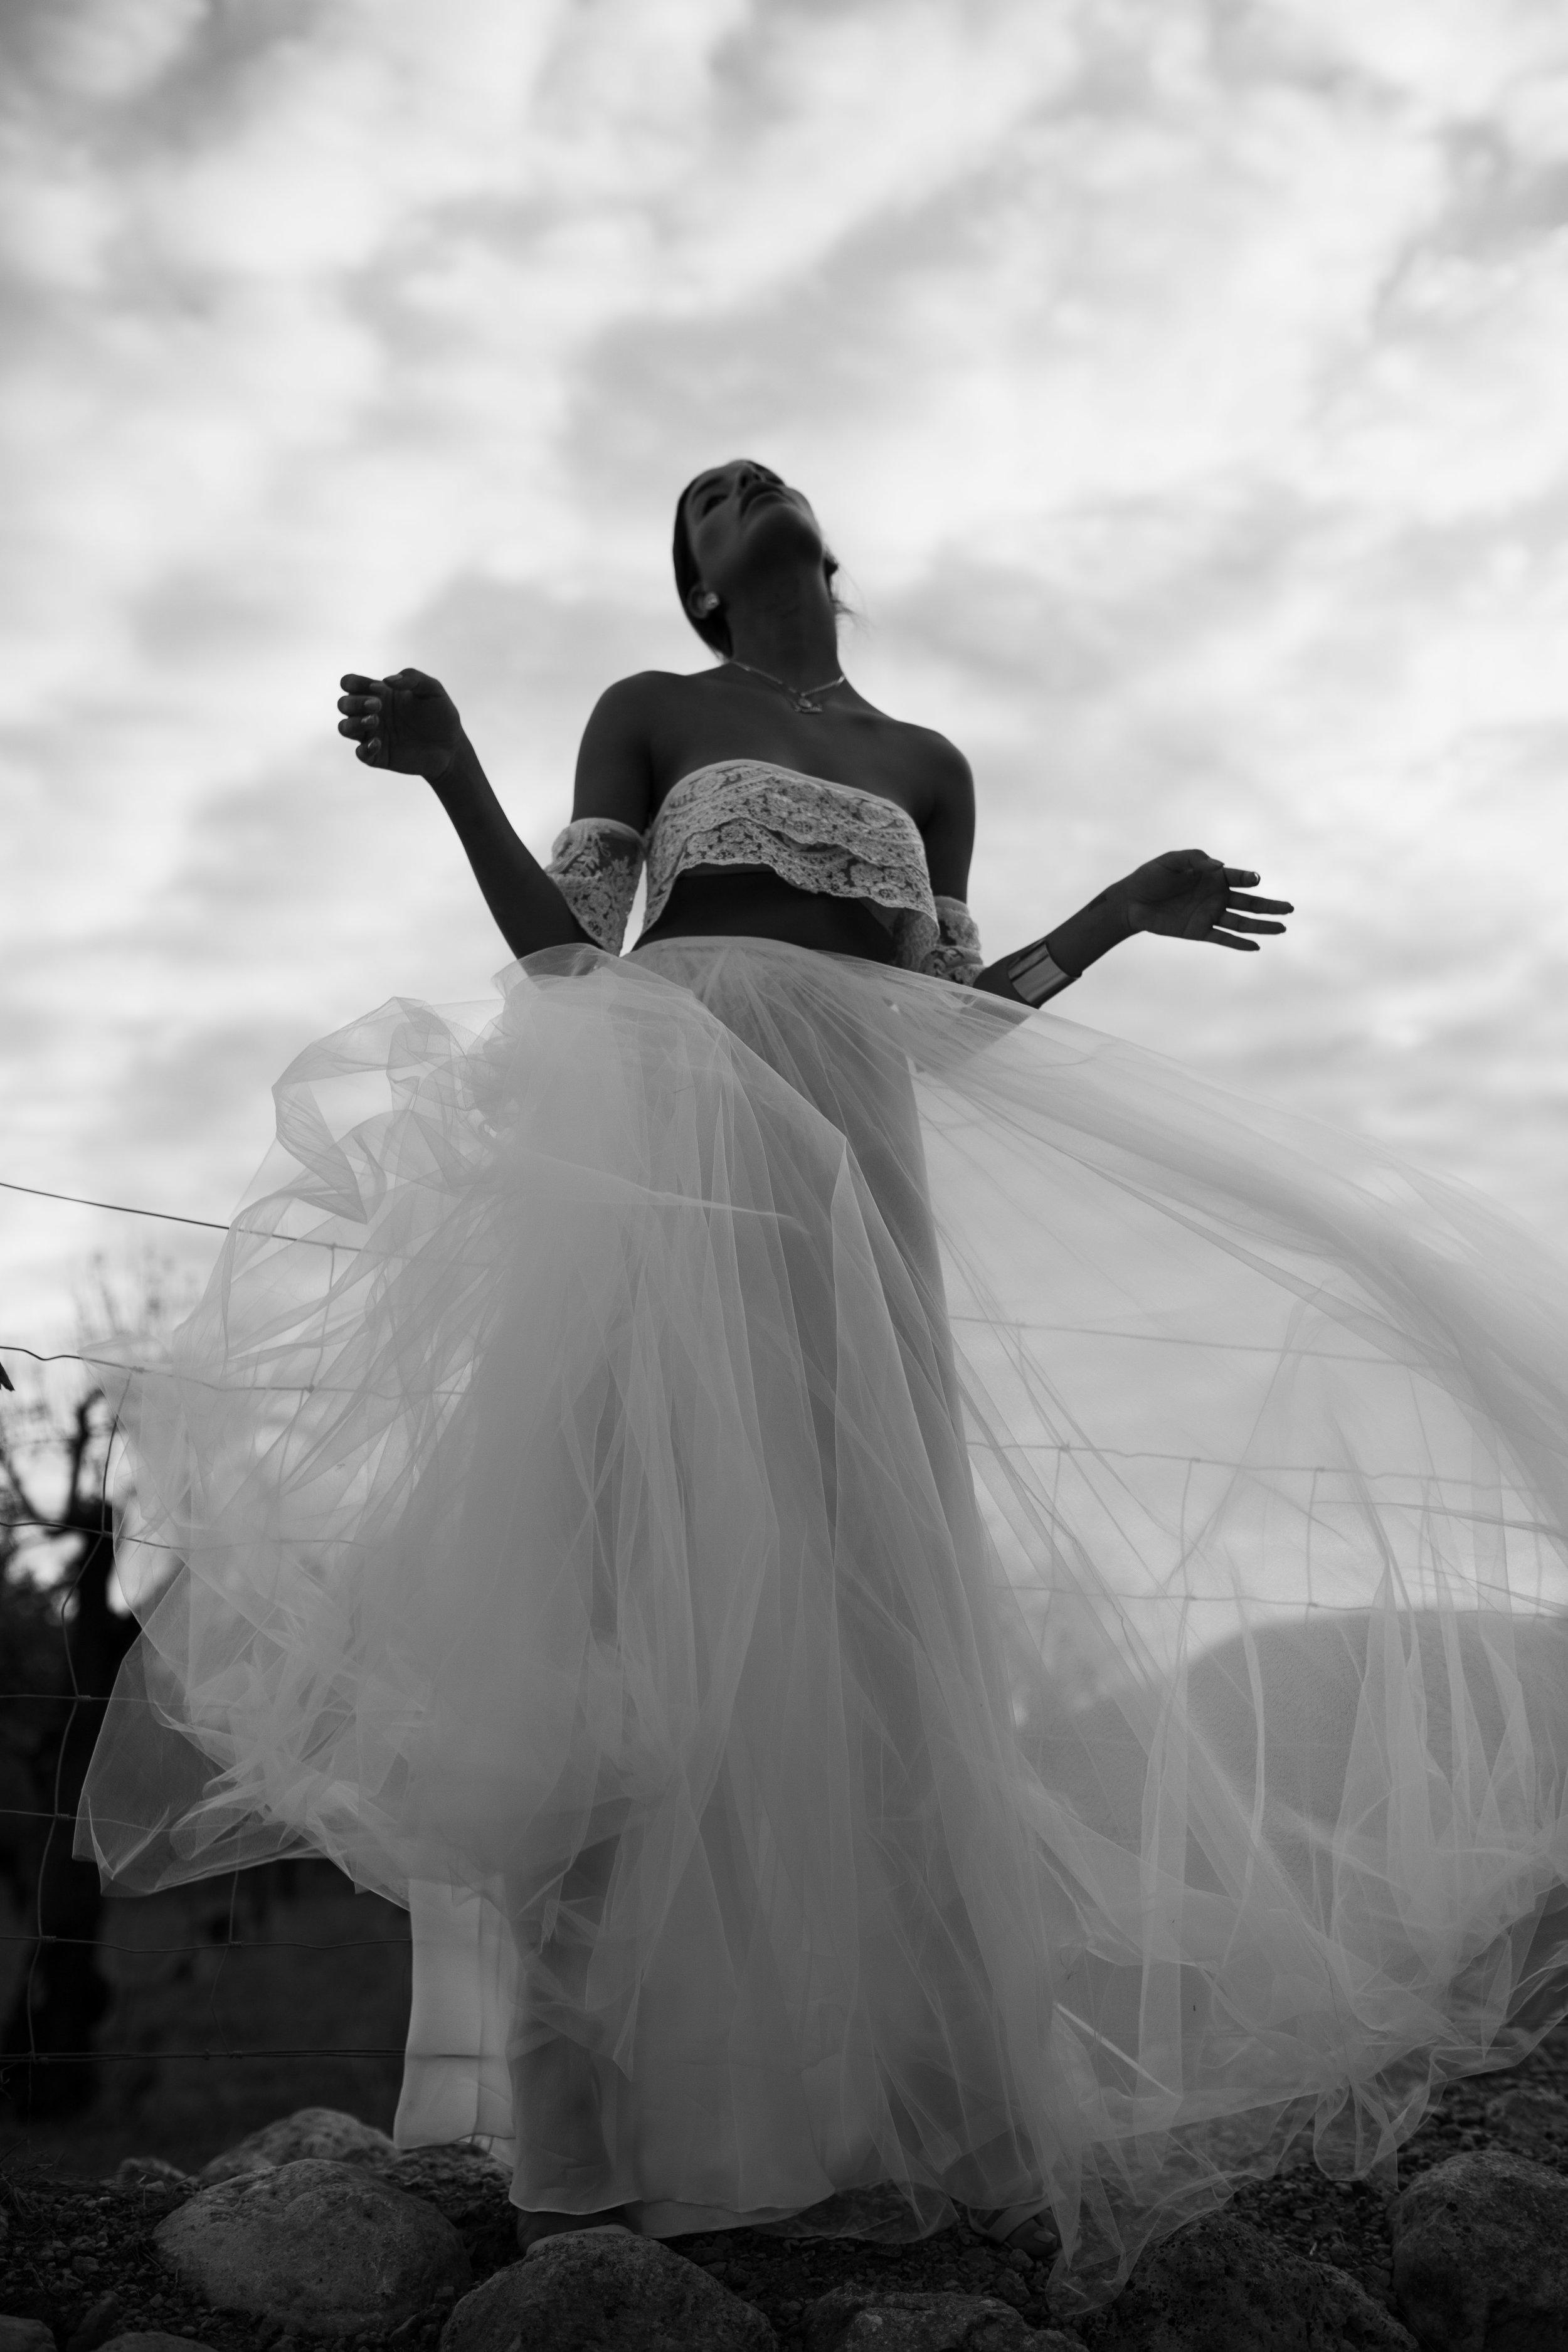 Mallorca-Hochzeit-Pia-Anna-Christian-Wedding-Photography-G-9.jpg